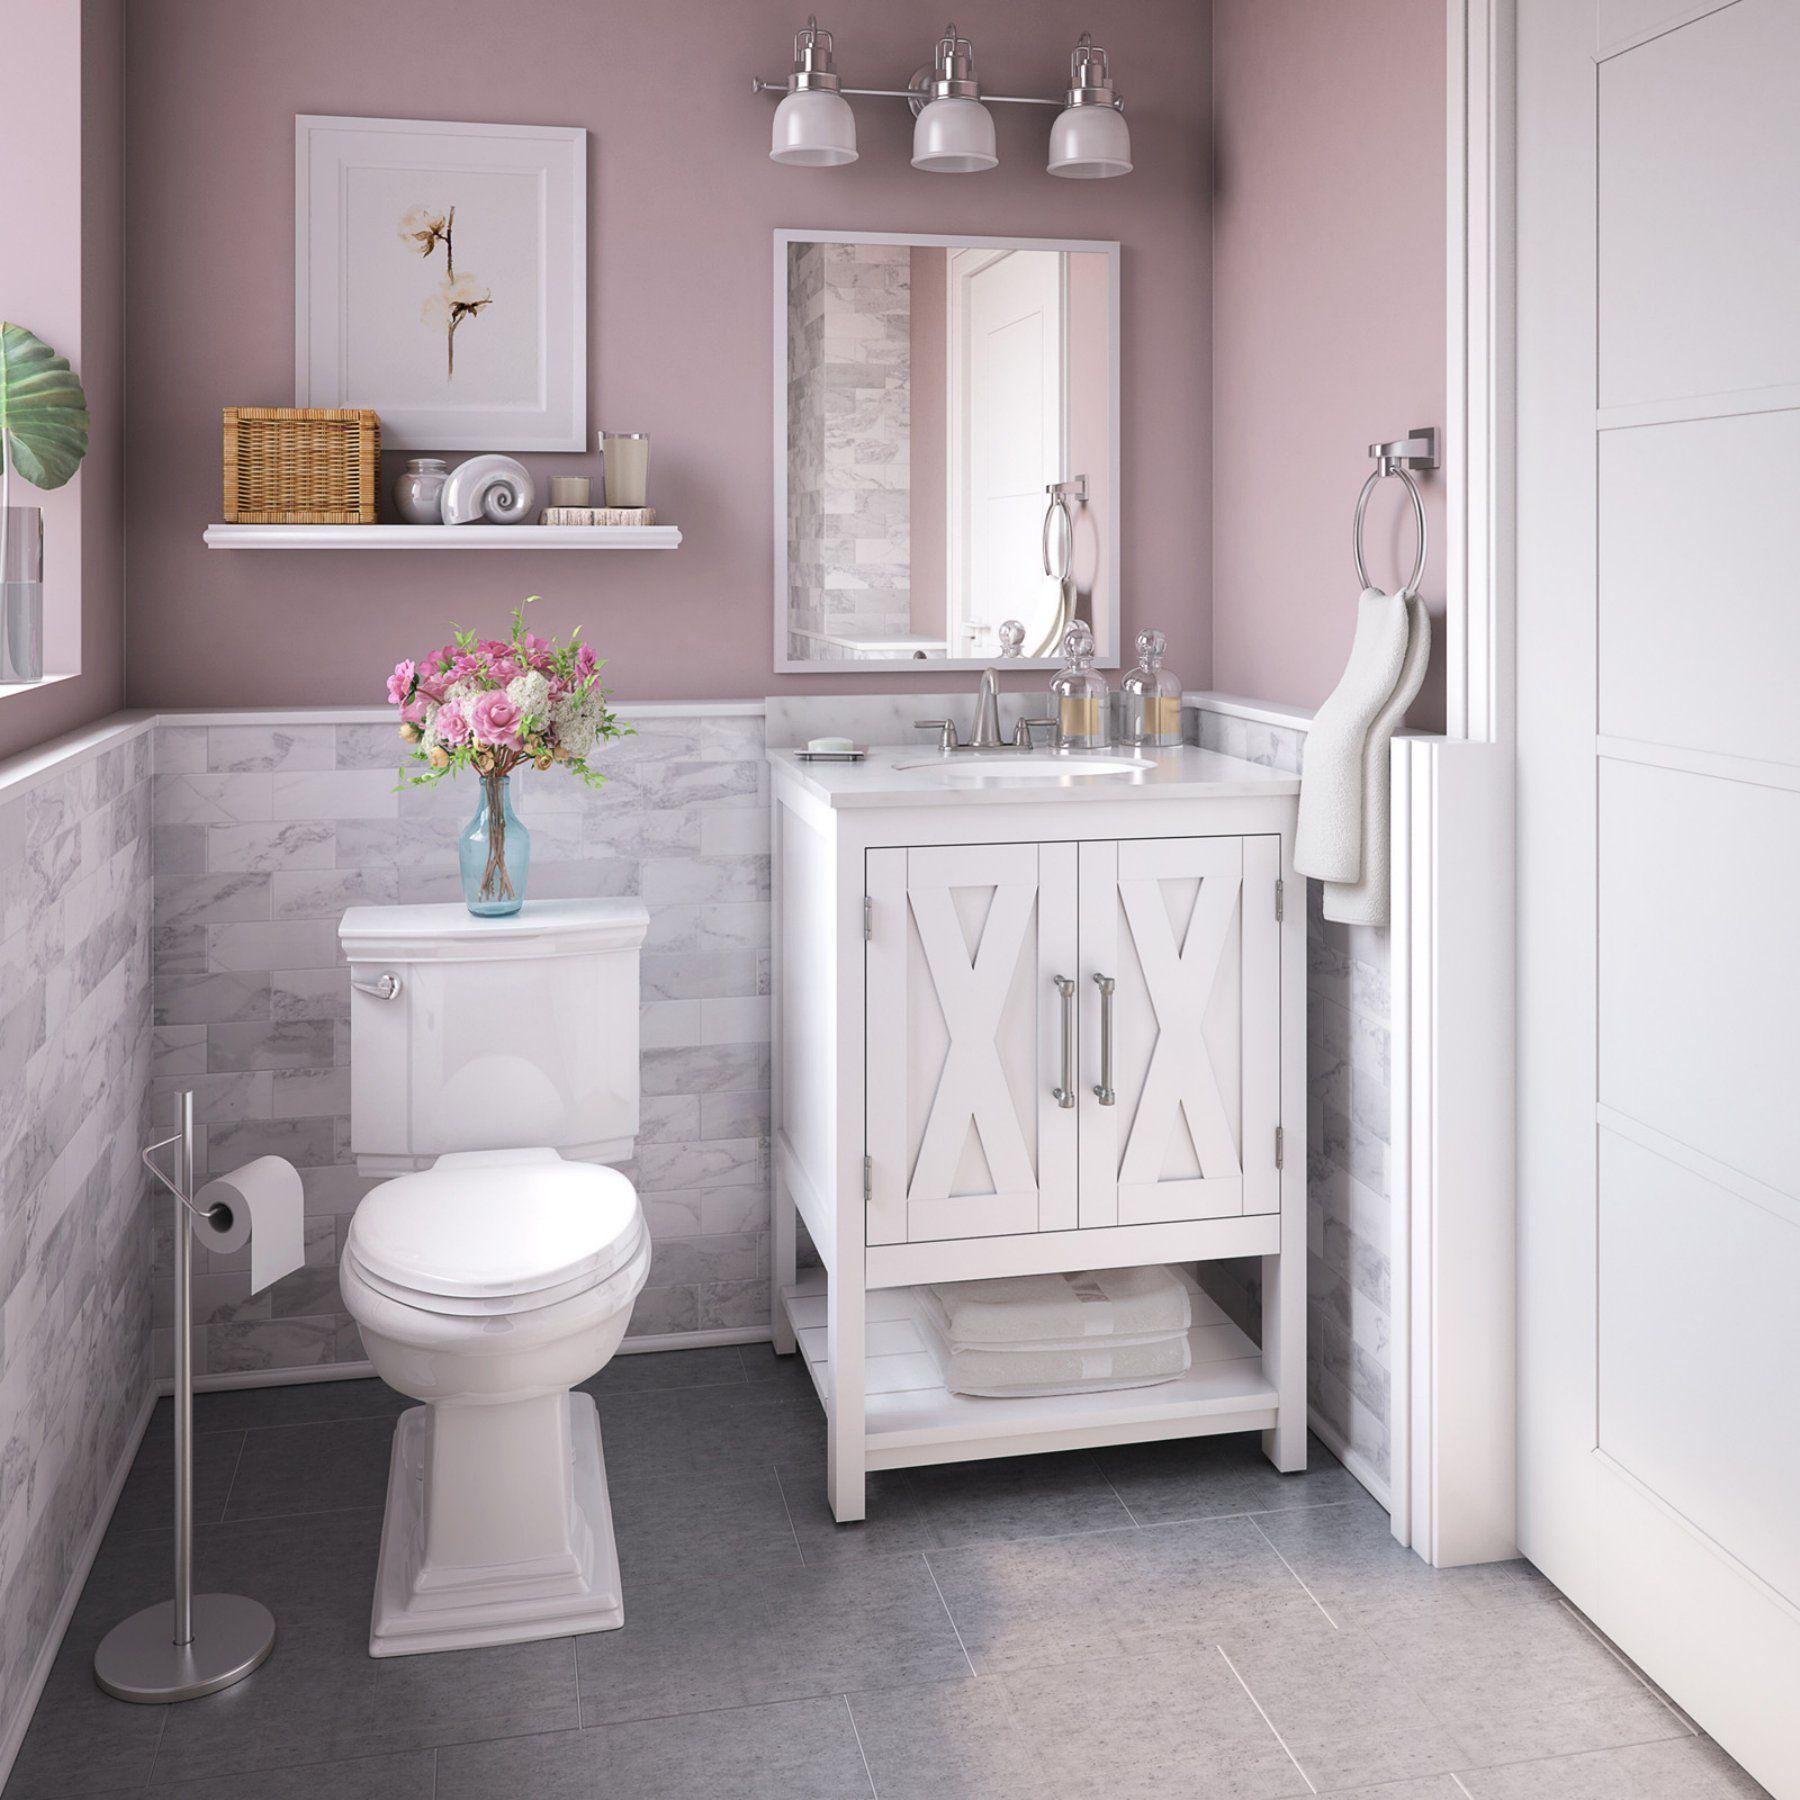 Bello Conington 24 In Freestanding Single Sink Bathroom